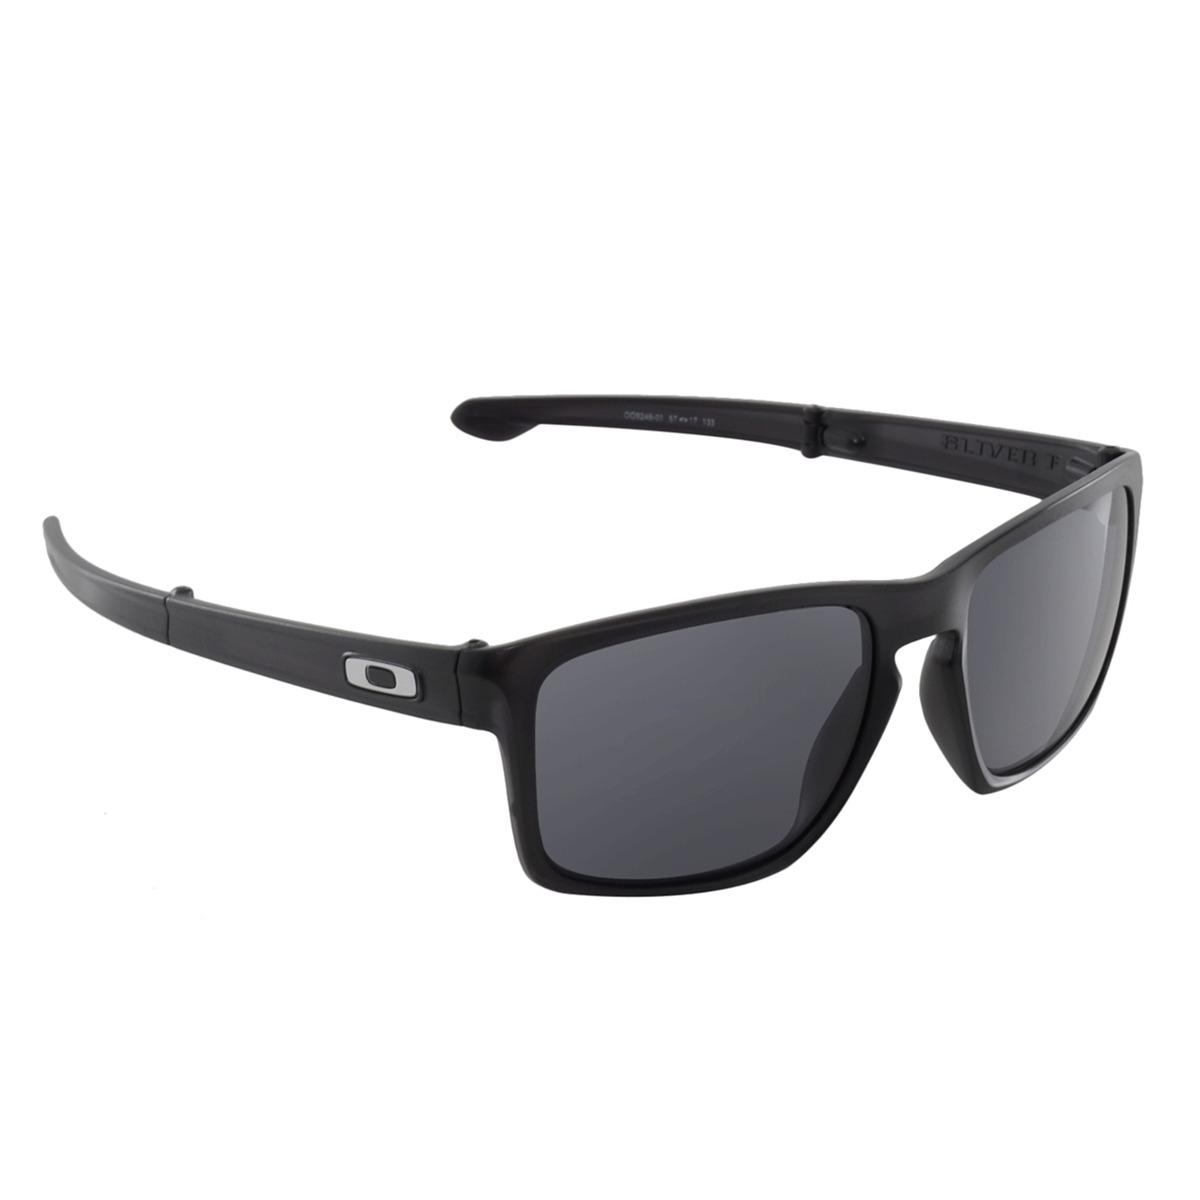 389d1a5ef799a Óculos Oakley Sliver F Matte Black - R  448,00 em Mercado Livre